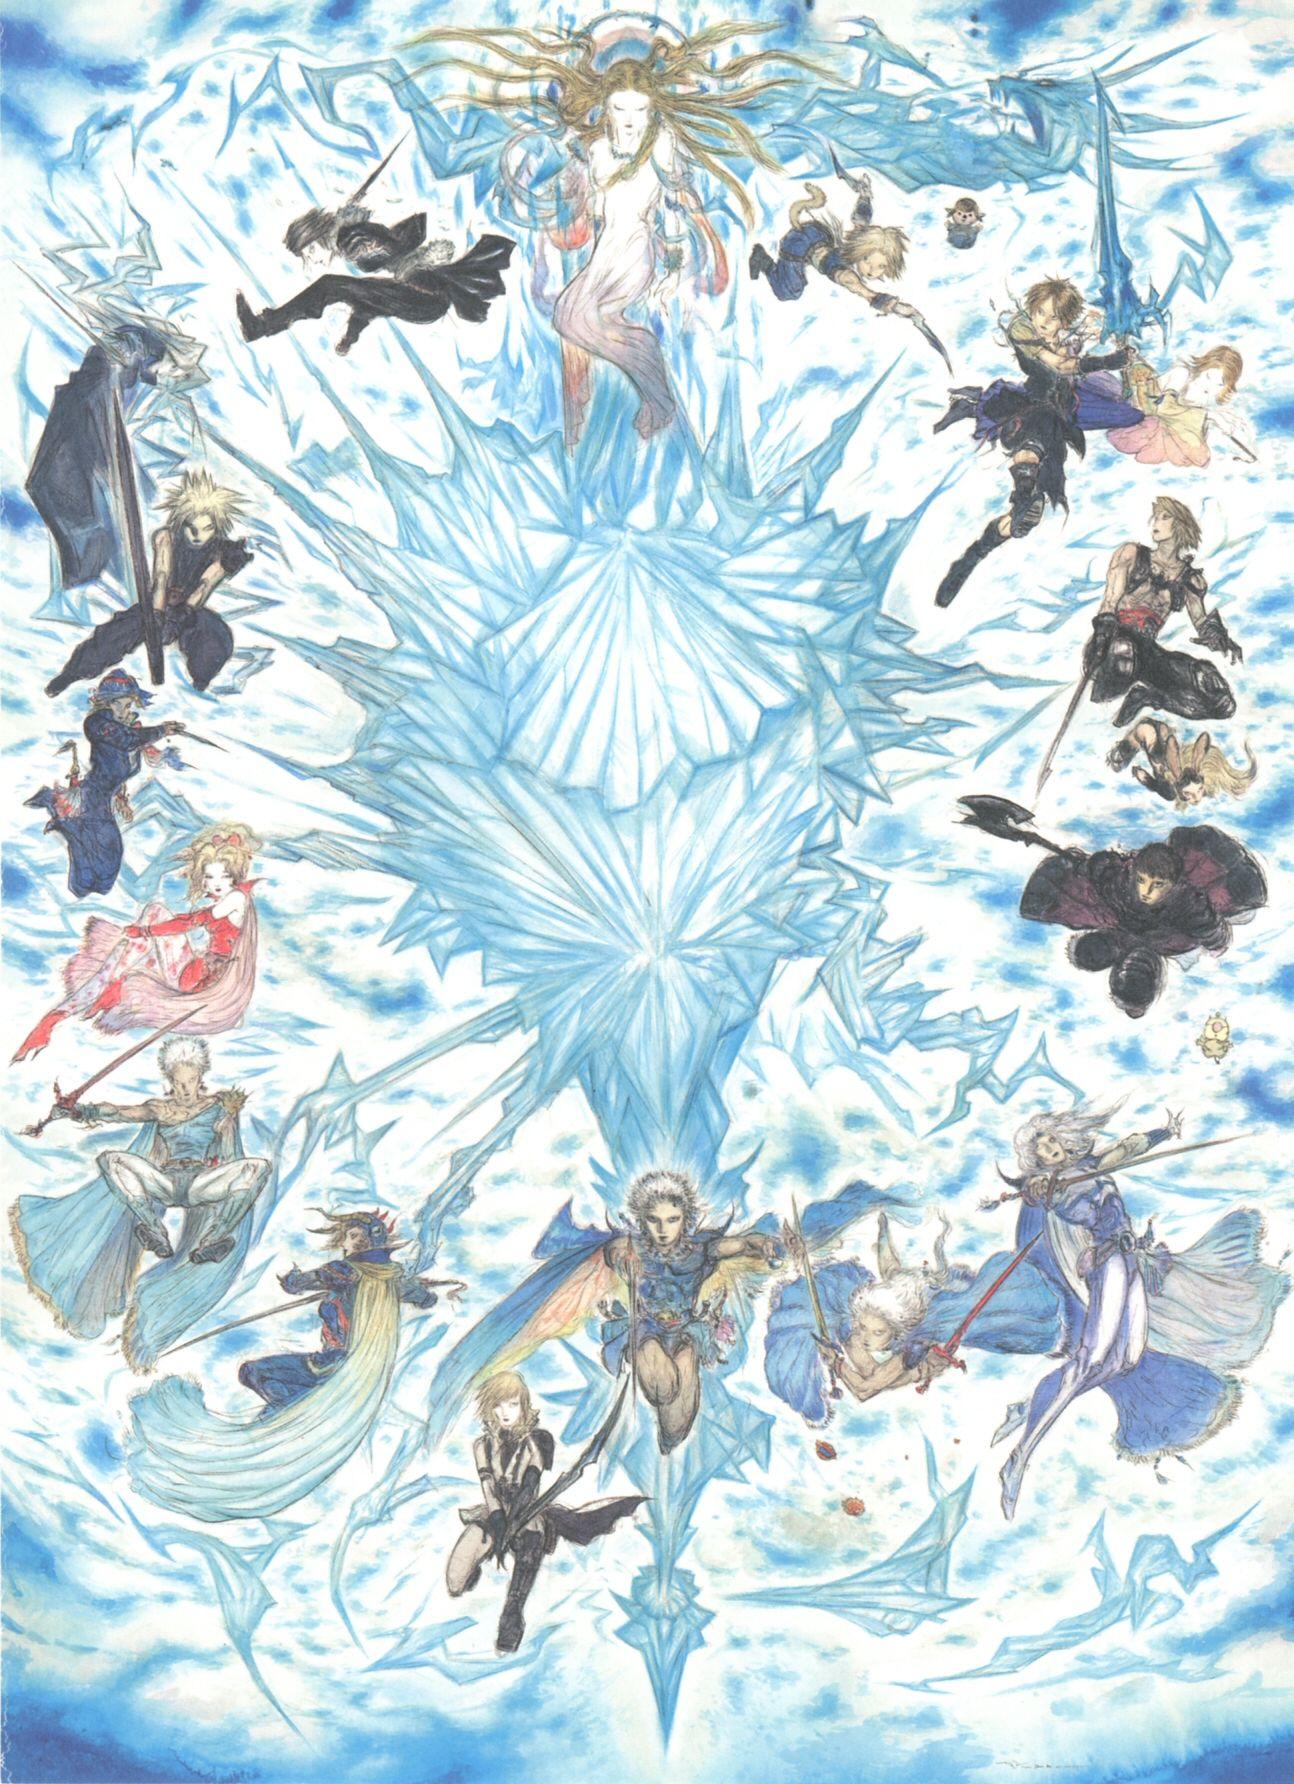 Yoshitaka Amano Final Fantasy Art Final Fantasy Artwork Fantasy Artwork